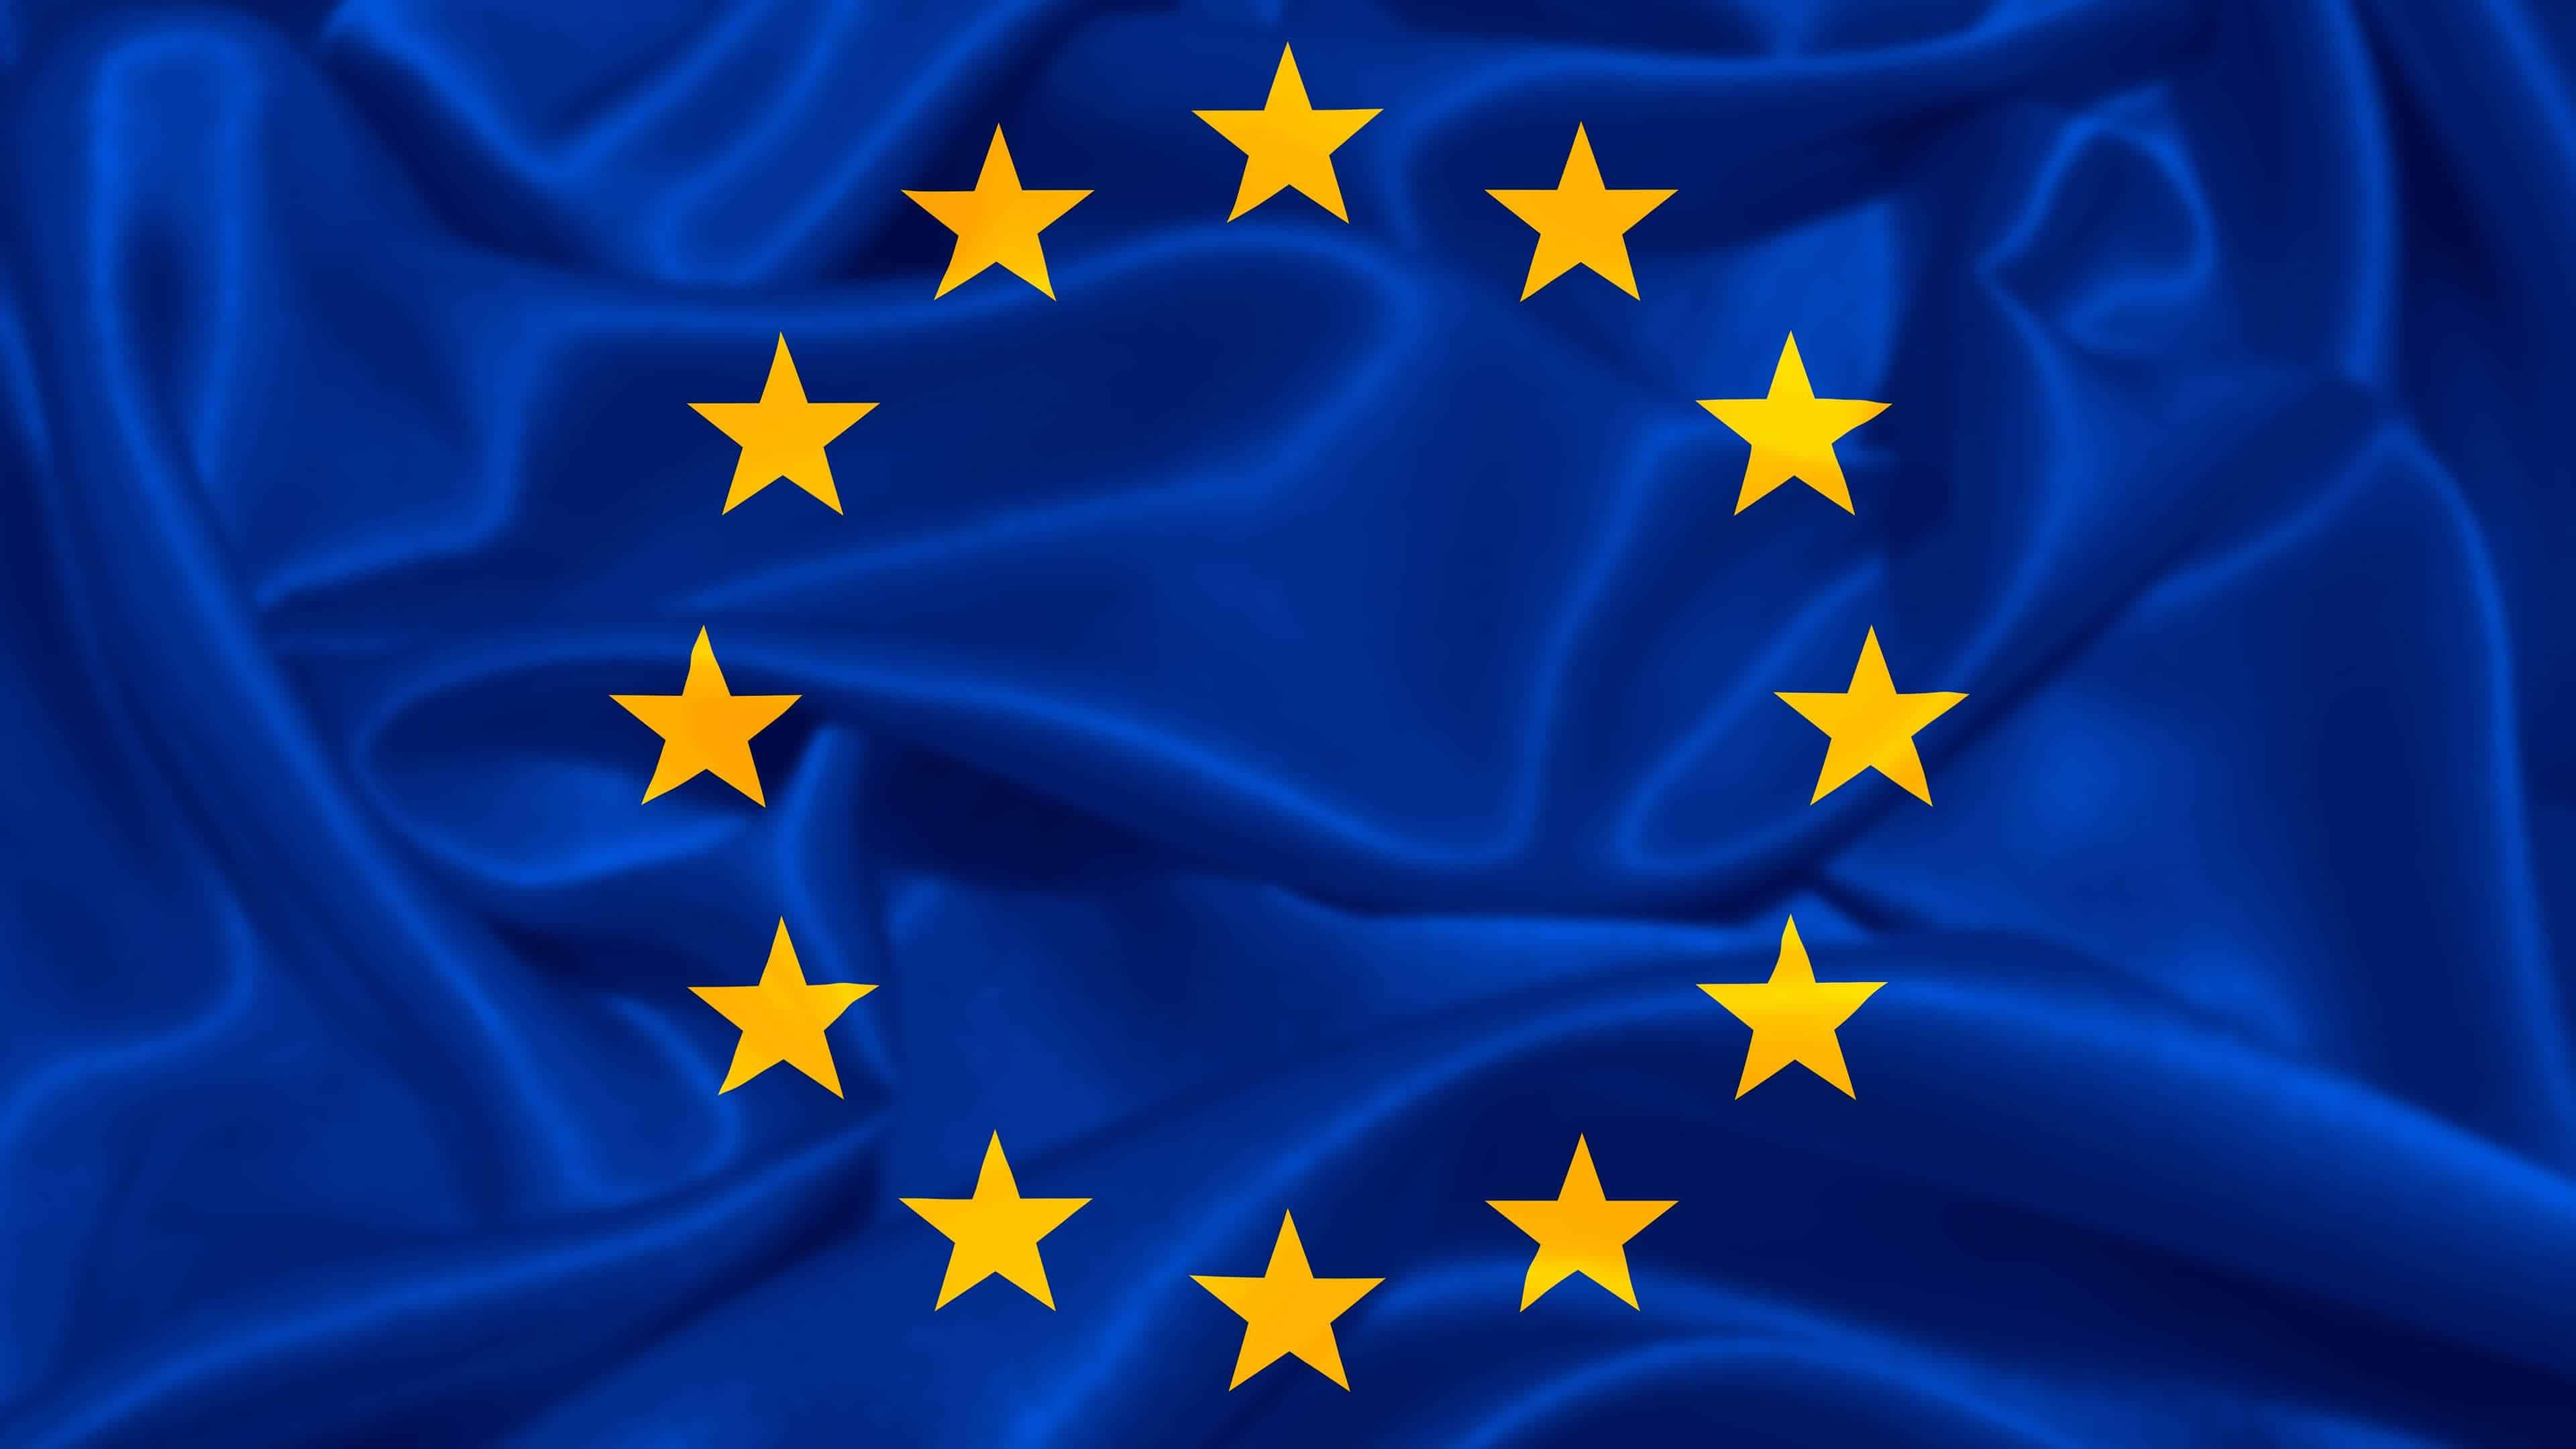 european union eu flag uhd 4k wallpaper